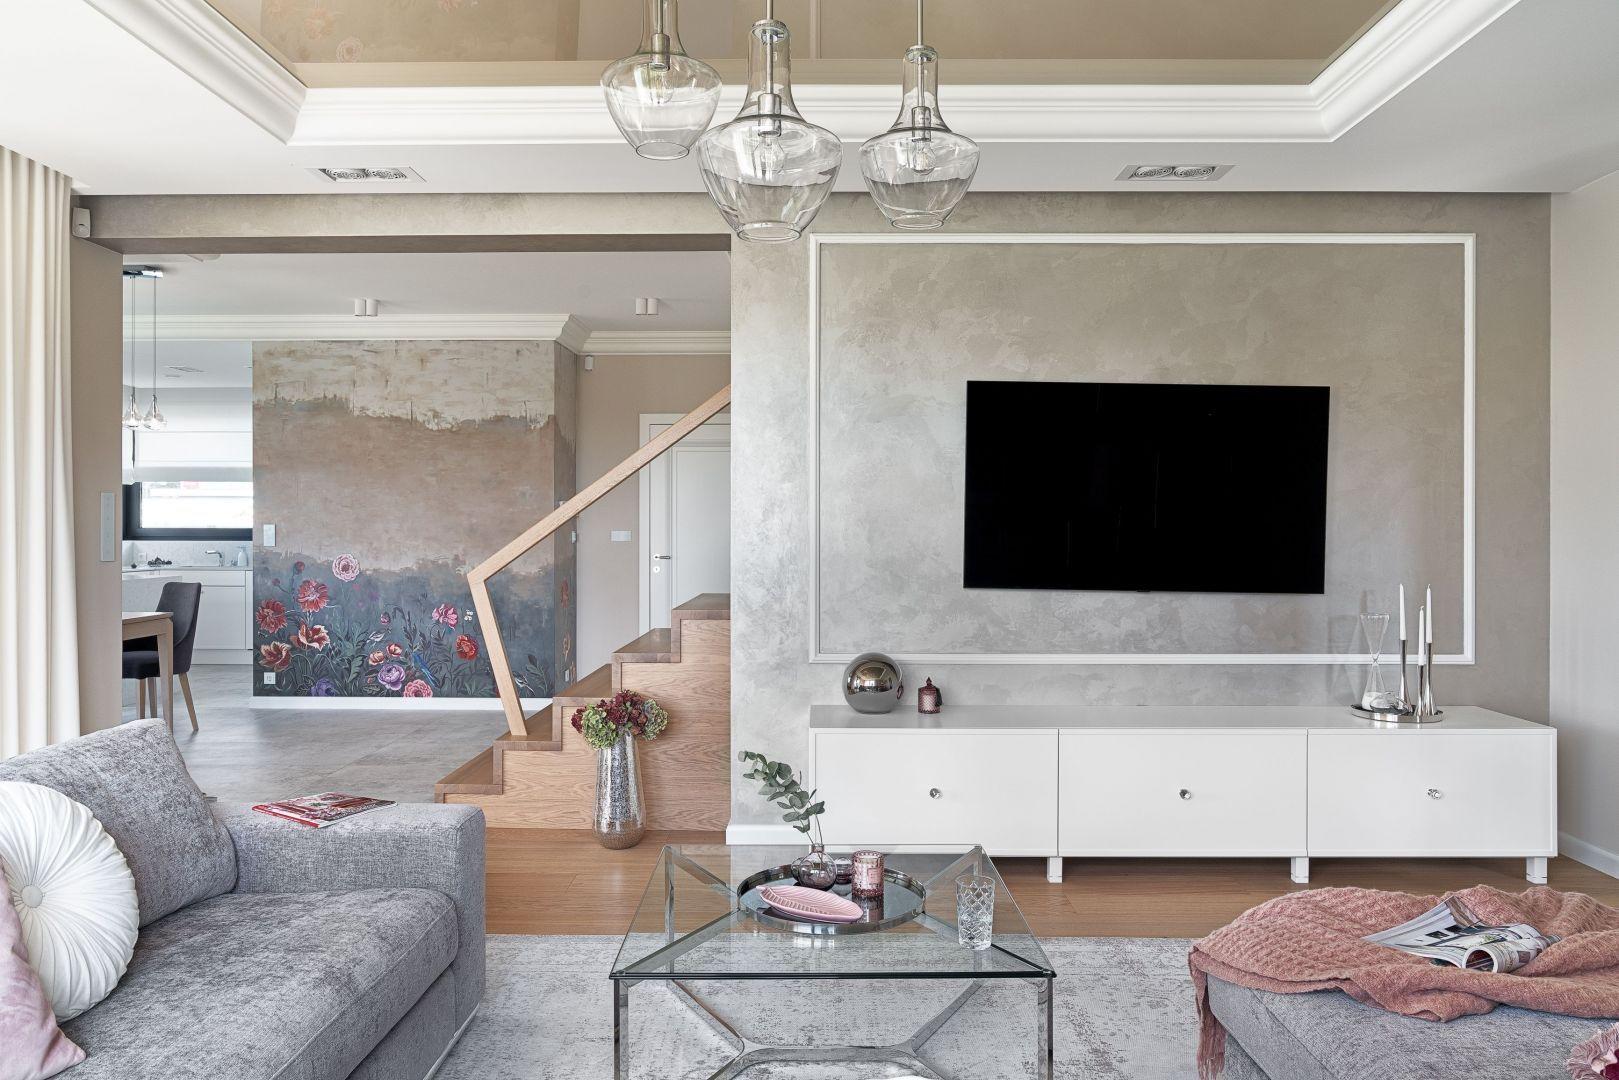 Ściana za telewizorem w salonie. Projekt Ewelina Rutkowska, studio projektowe Meteor. Fot. Tom Kurek